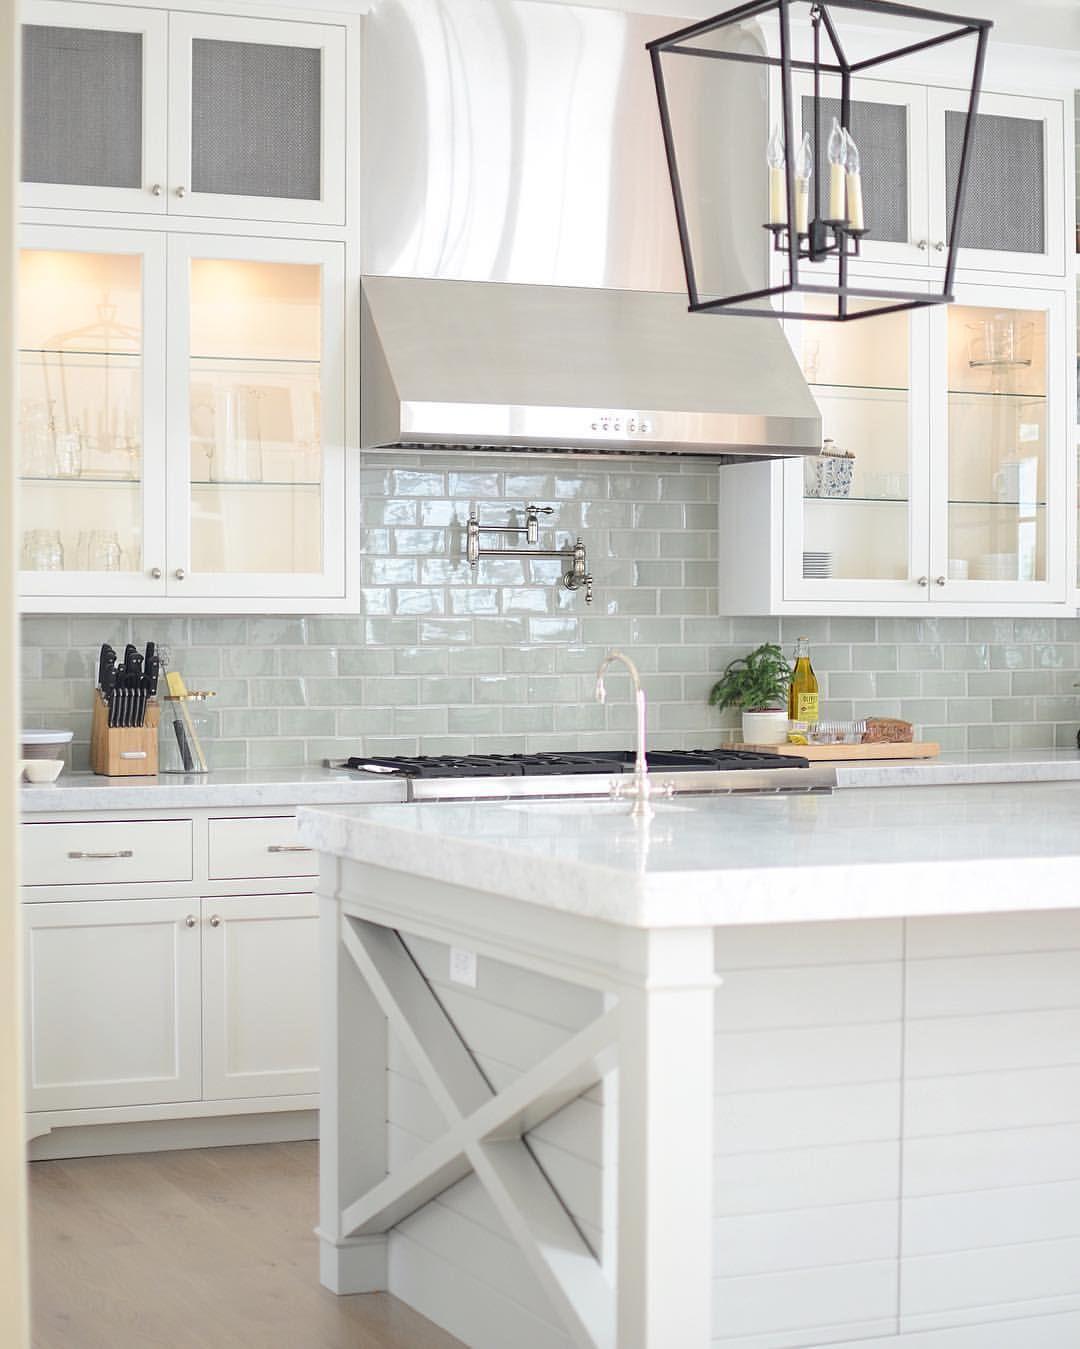 White Kitchen Black Subway Tile Backsplash Decorkeun